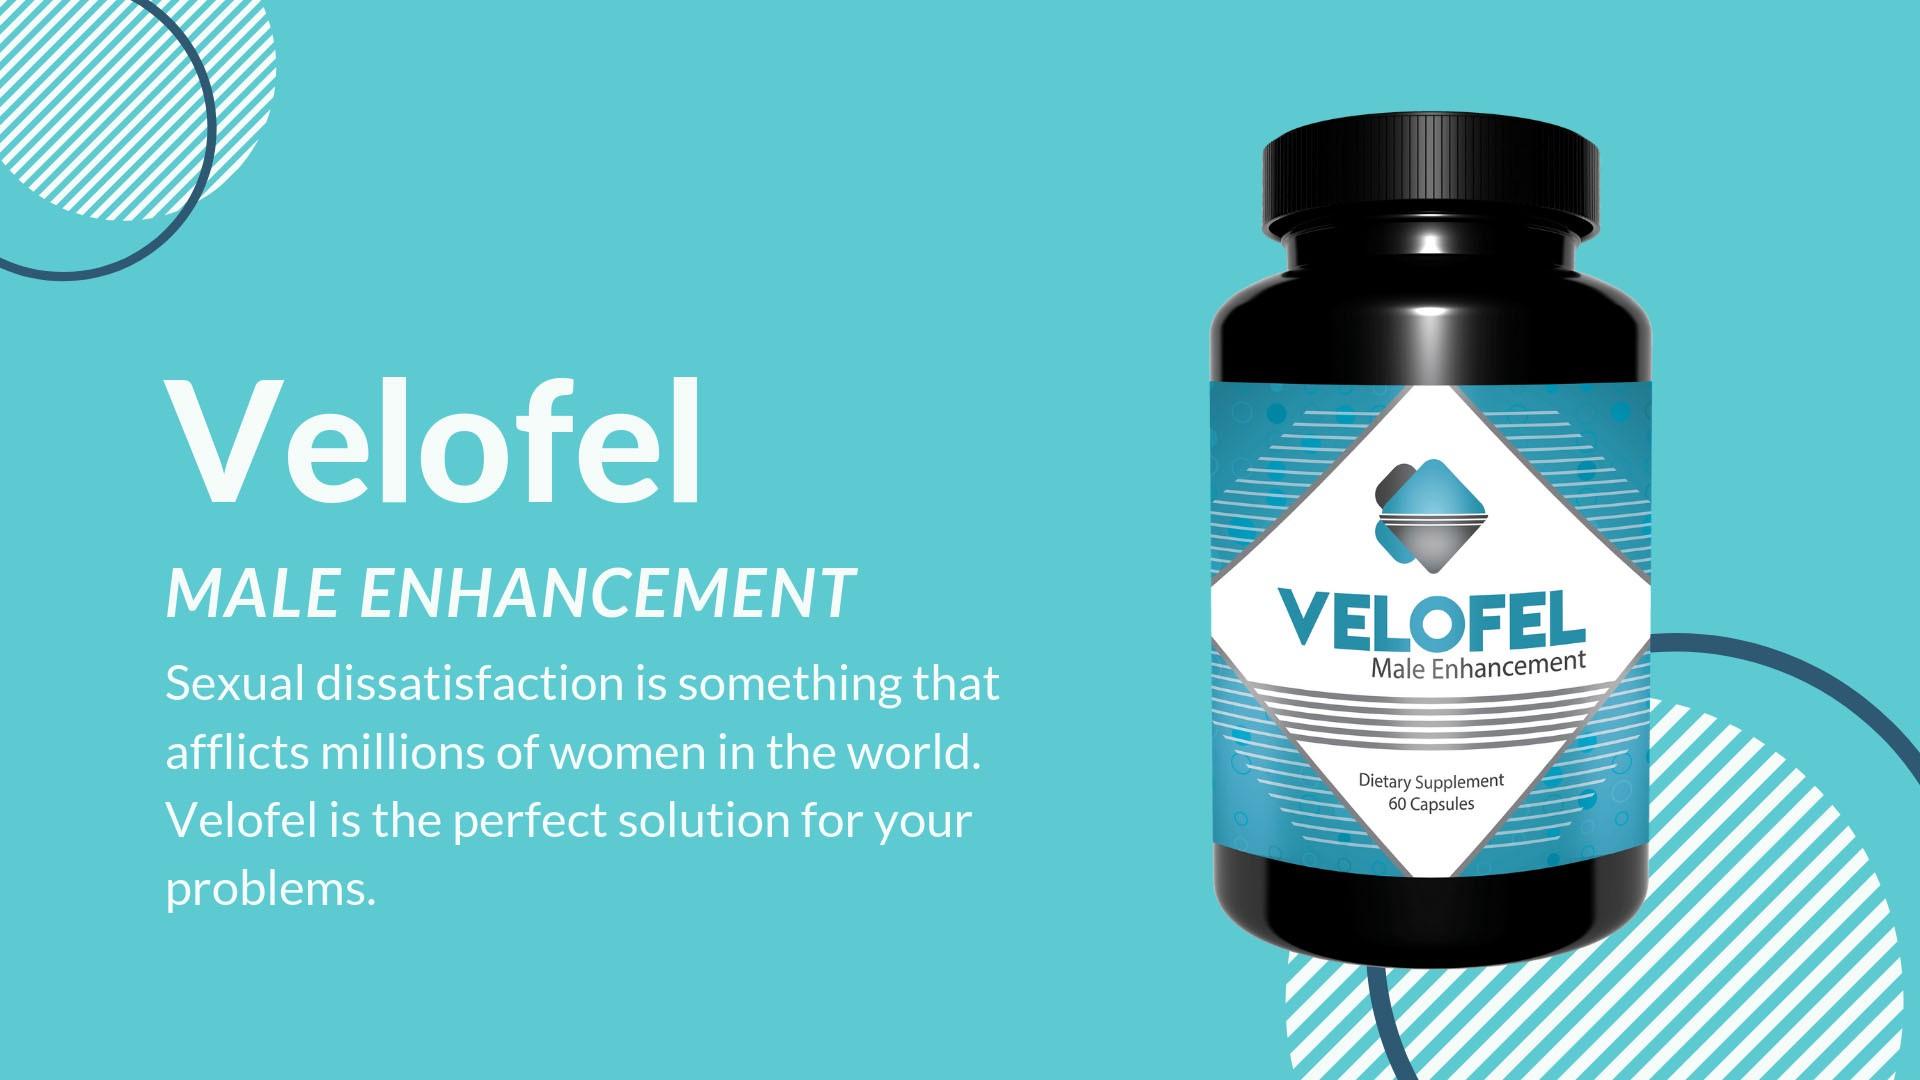 Velofel -  en pharmacie - crème - France